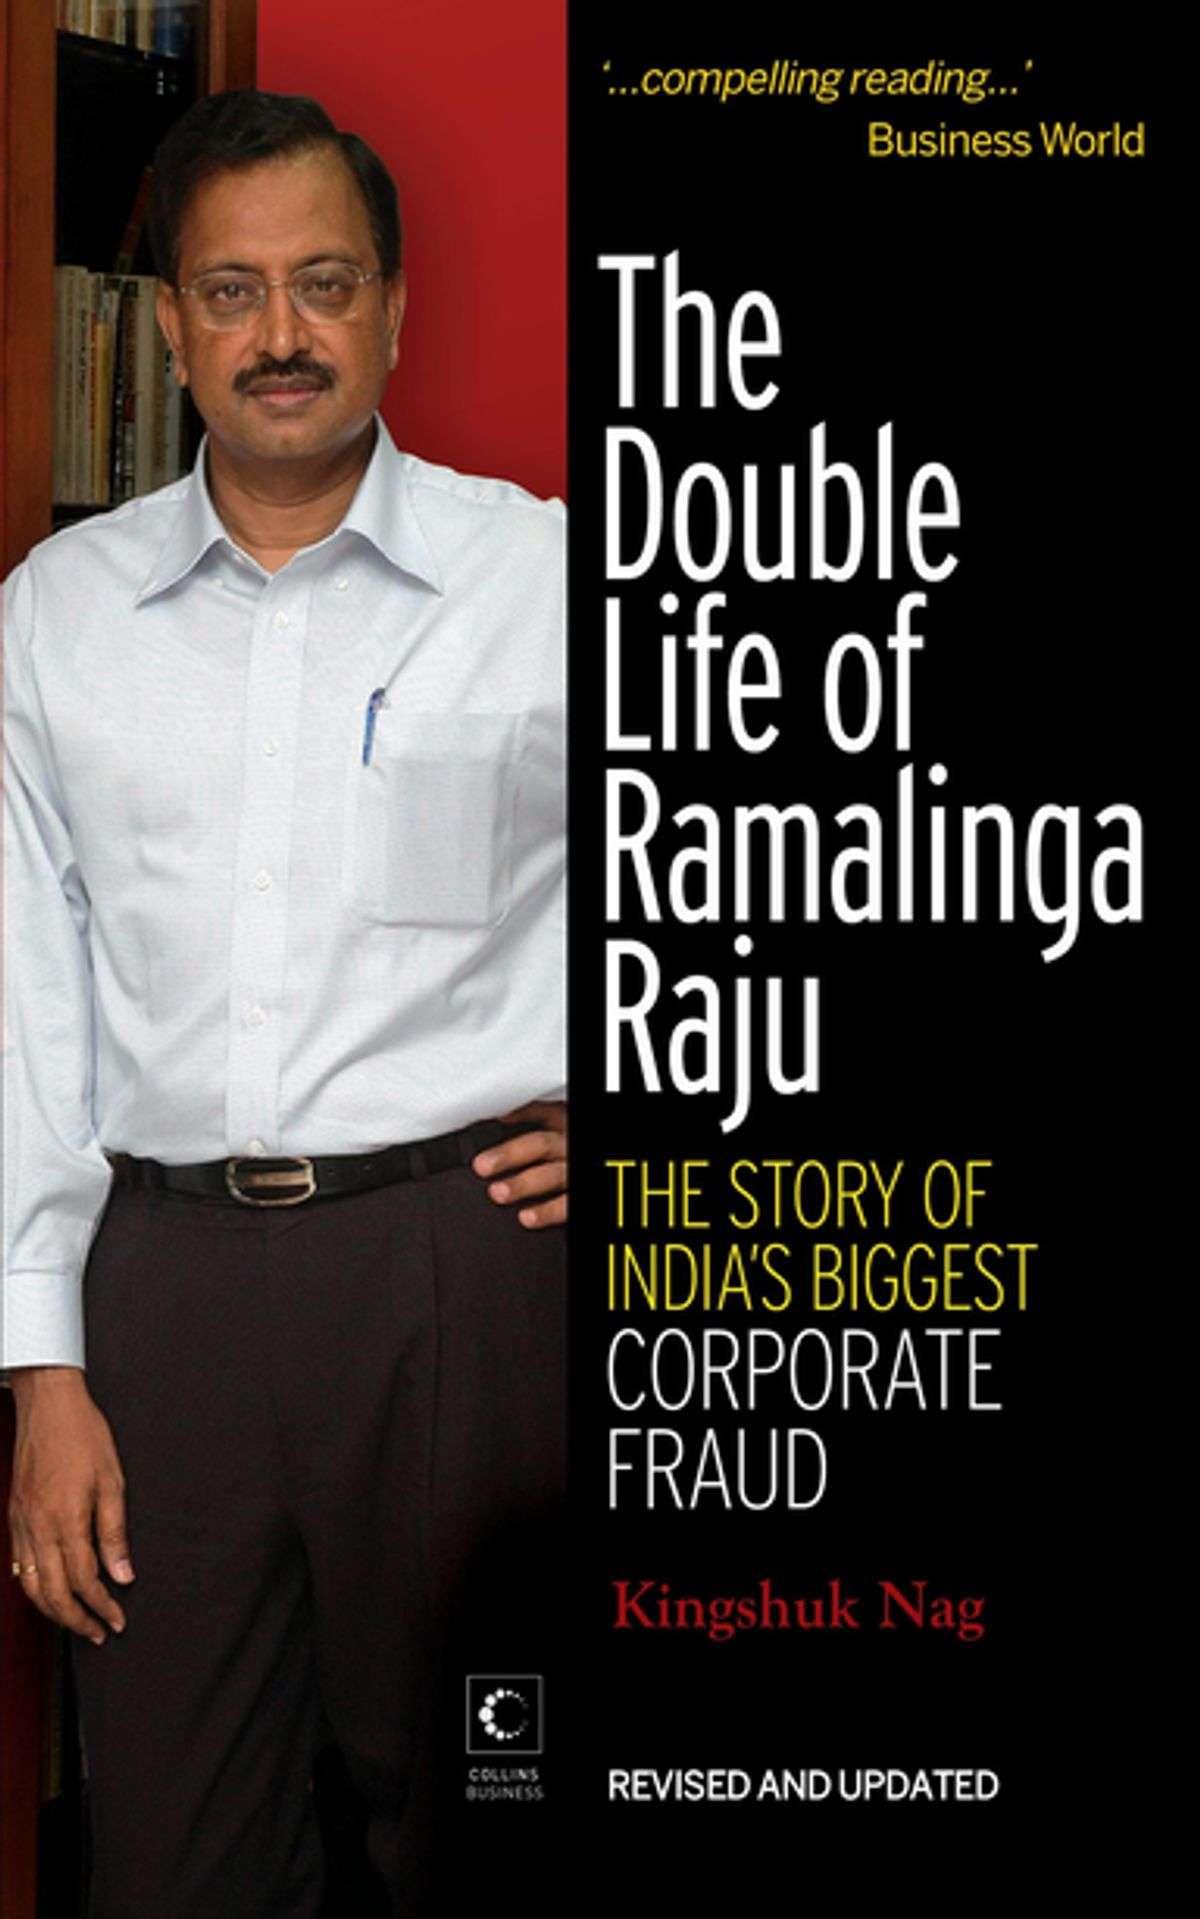 9. The Double Life of Ramalinga Raju